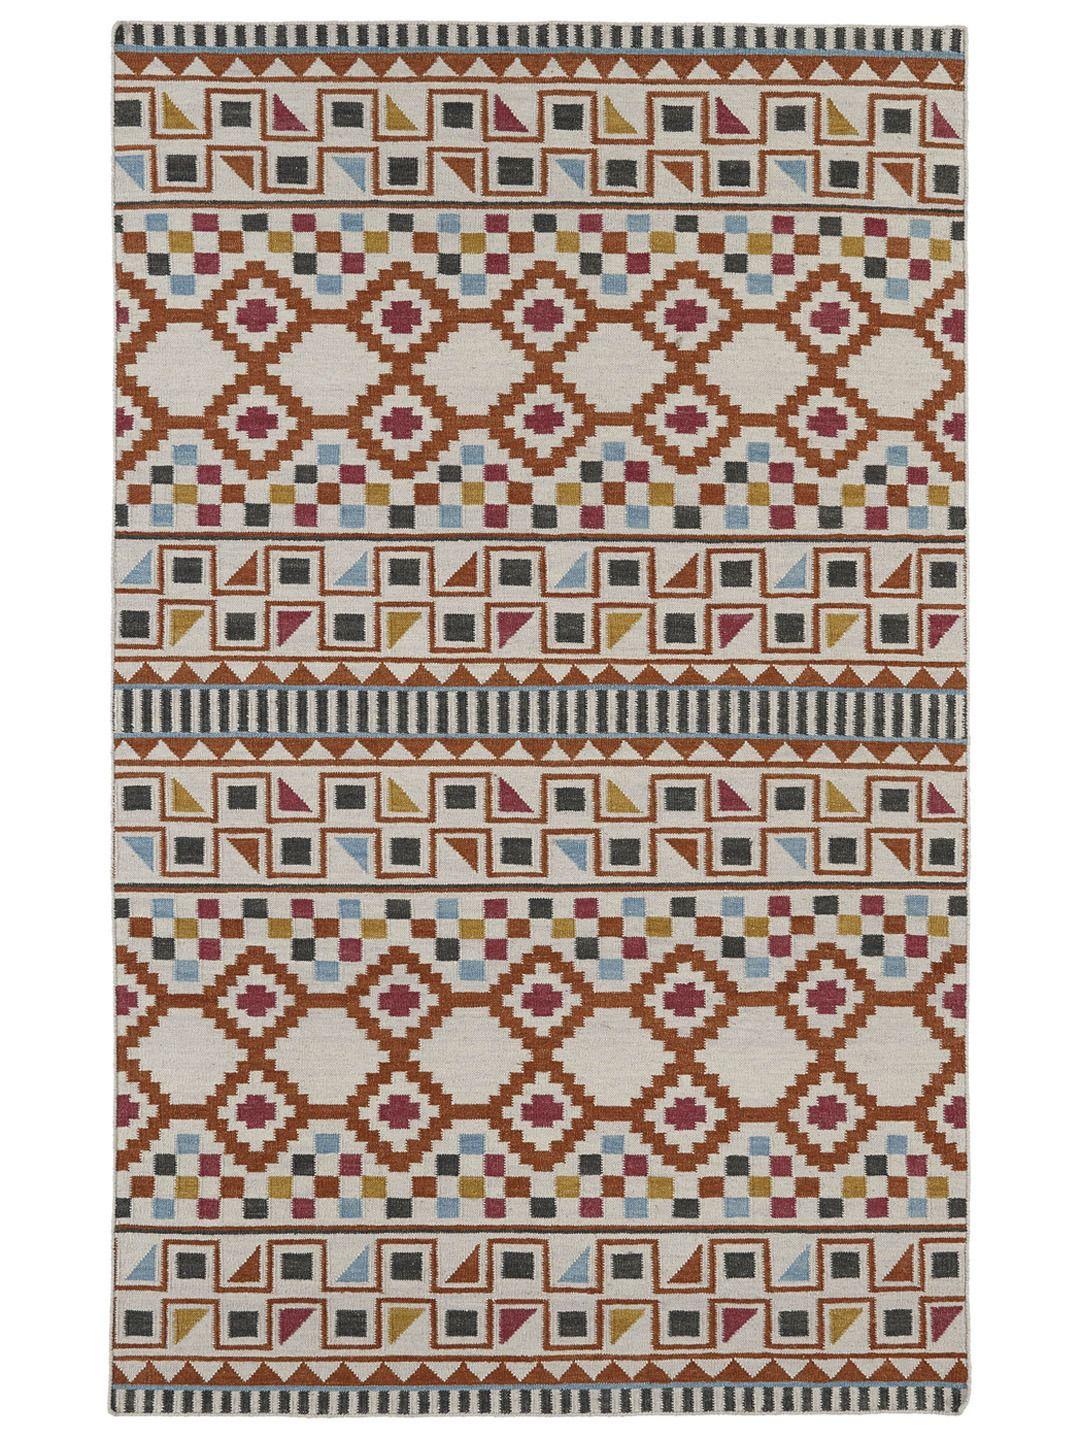 Bath nomad flatweave rug by kaleen at gilt